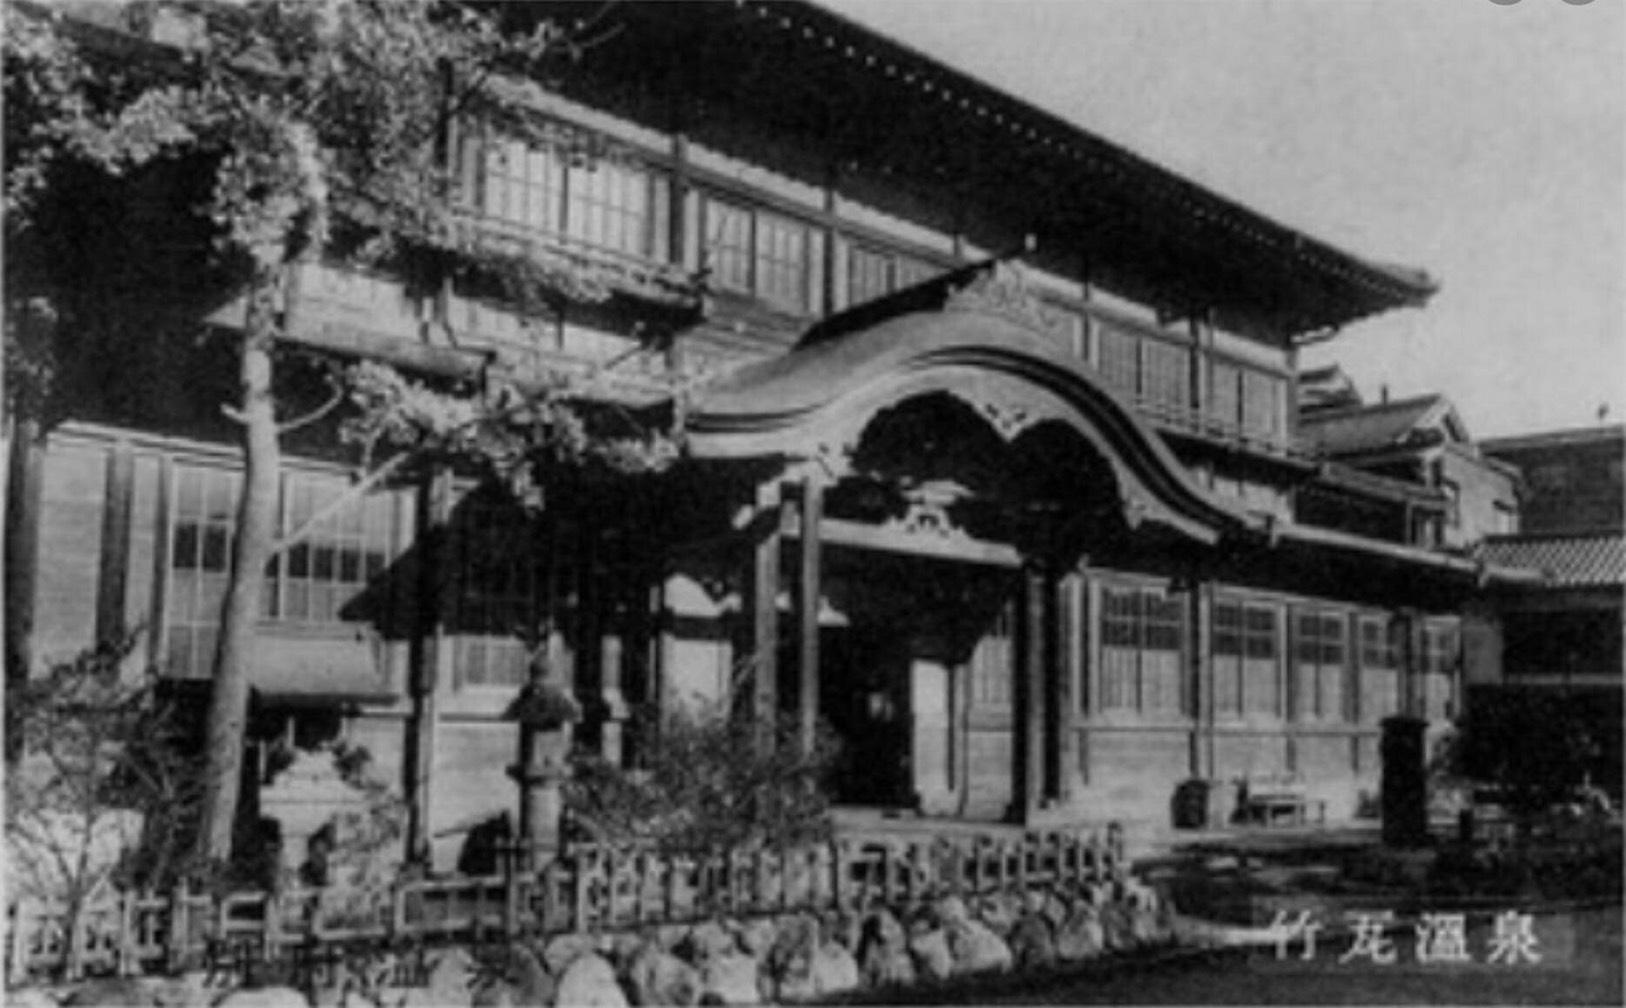 takegawara facade